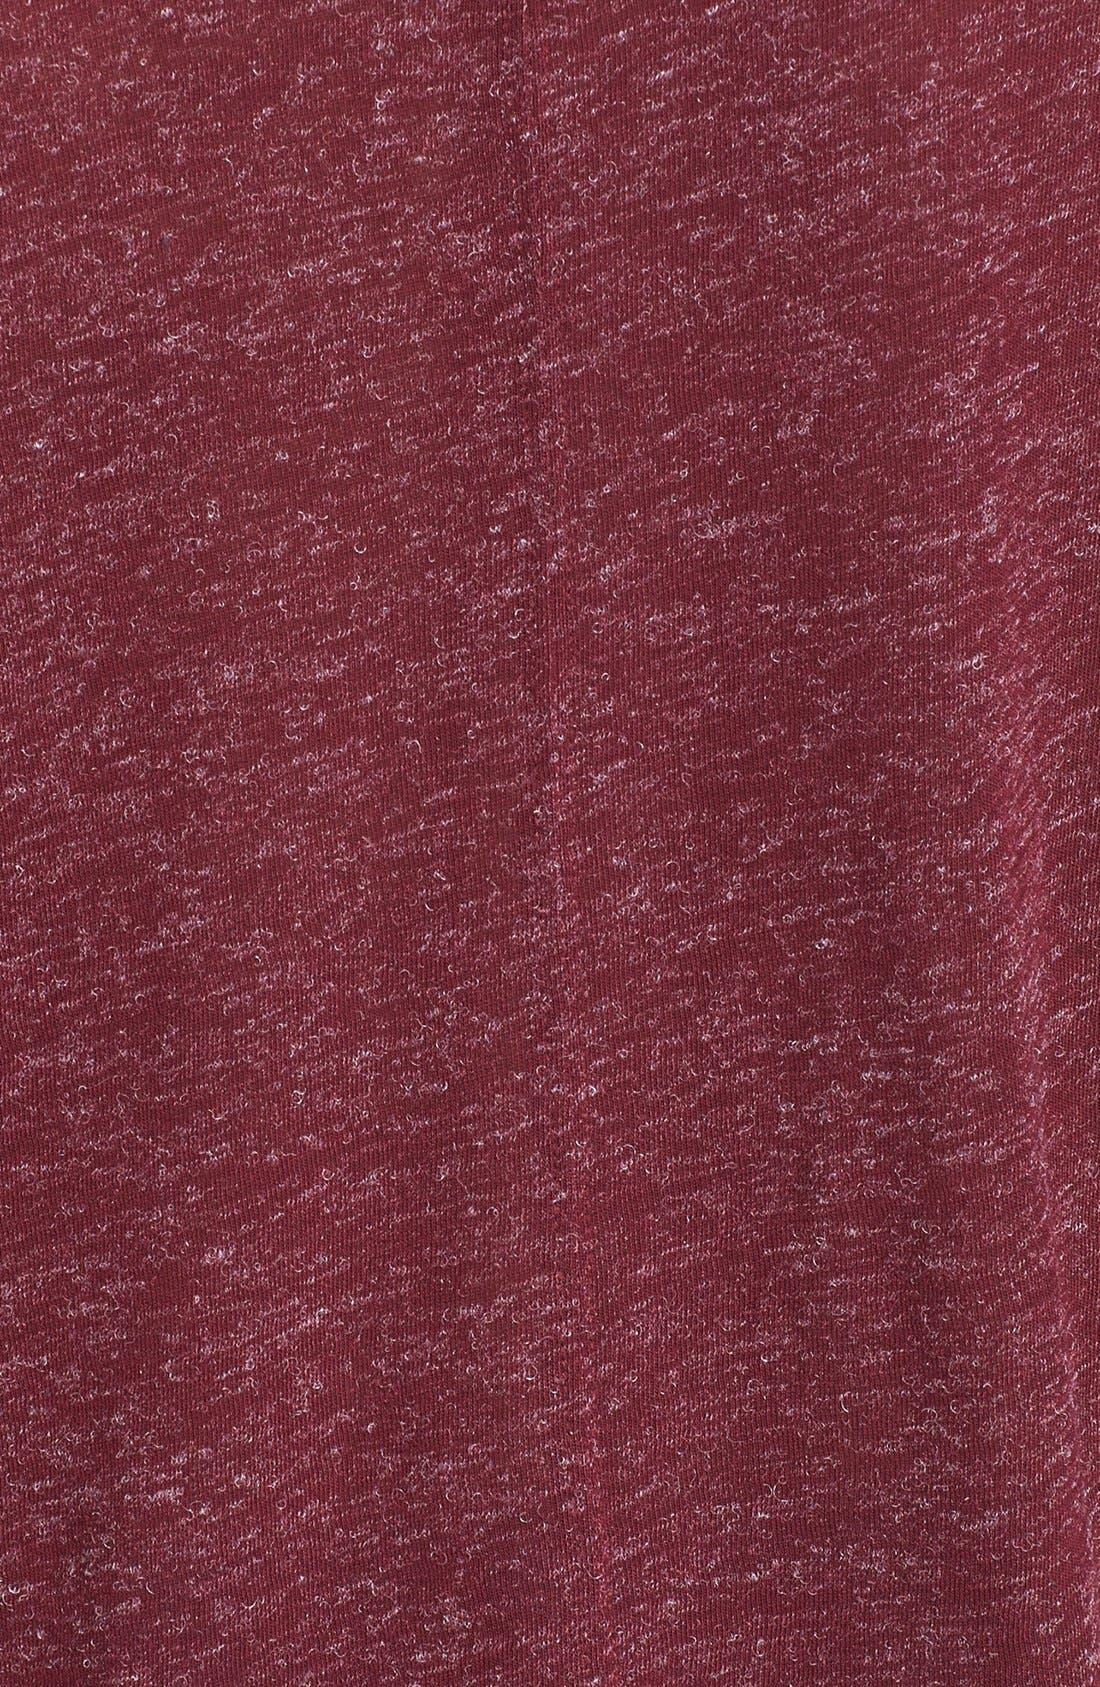 Alternate Image 3  - Topshop Long Sleeve Textured Top